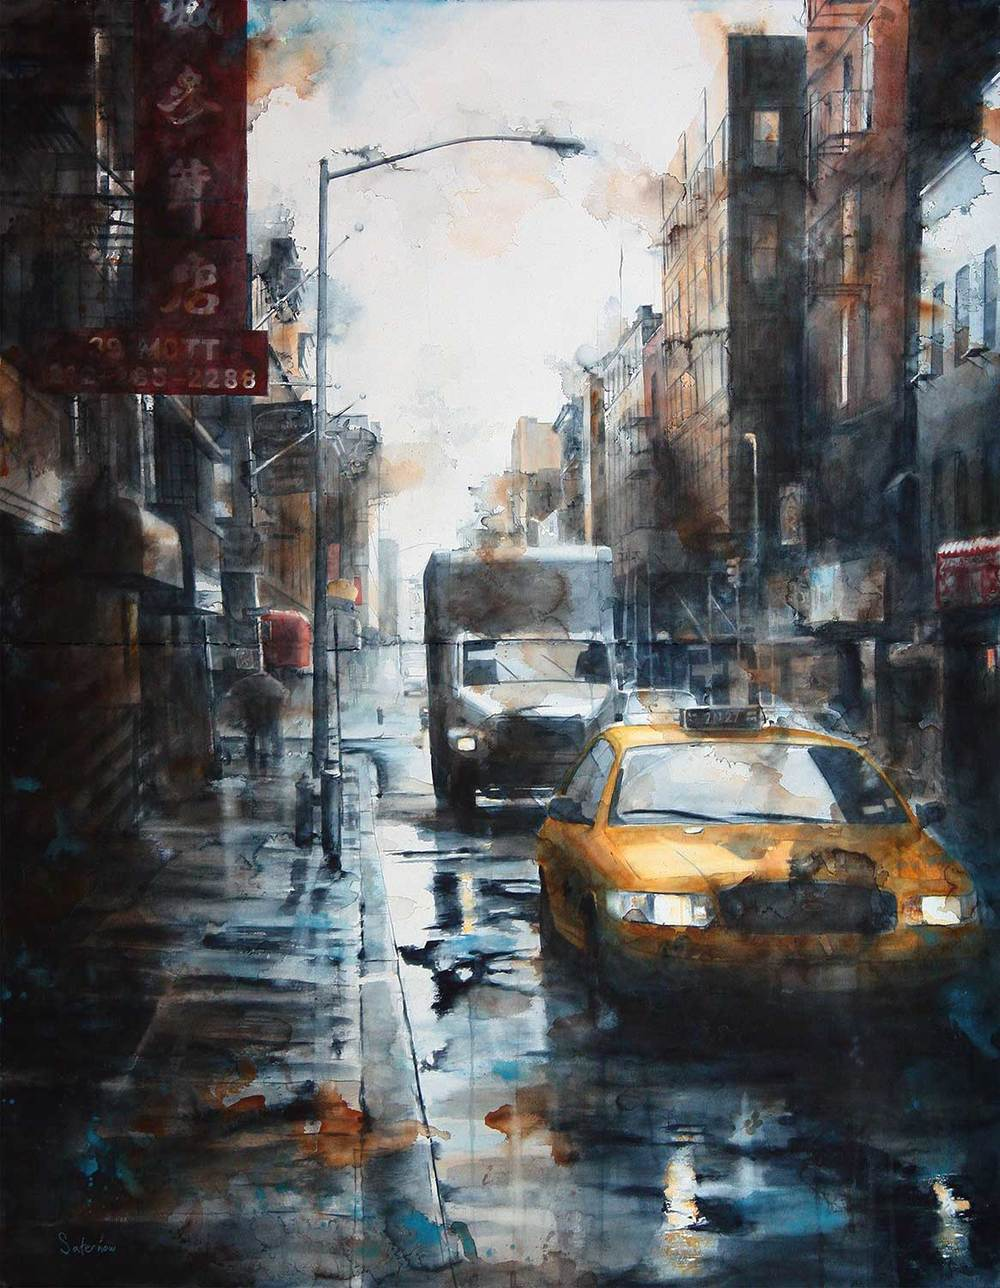 39 Mott Street, rain (Diptych)